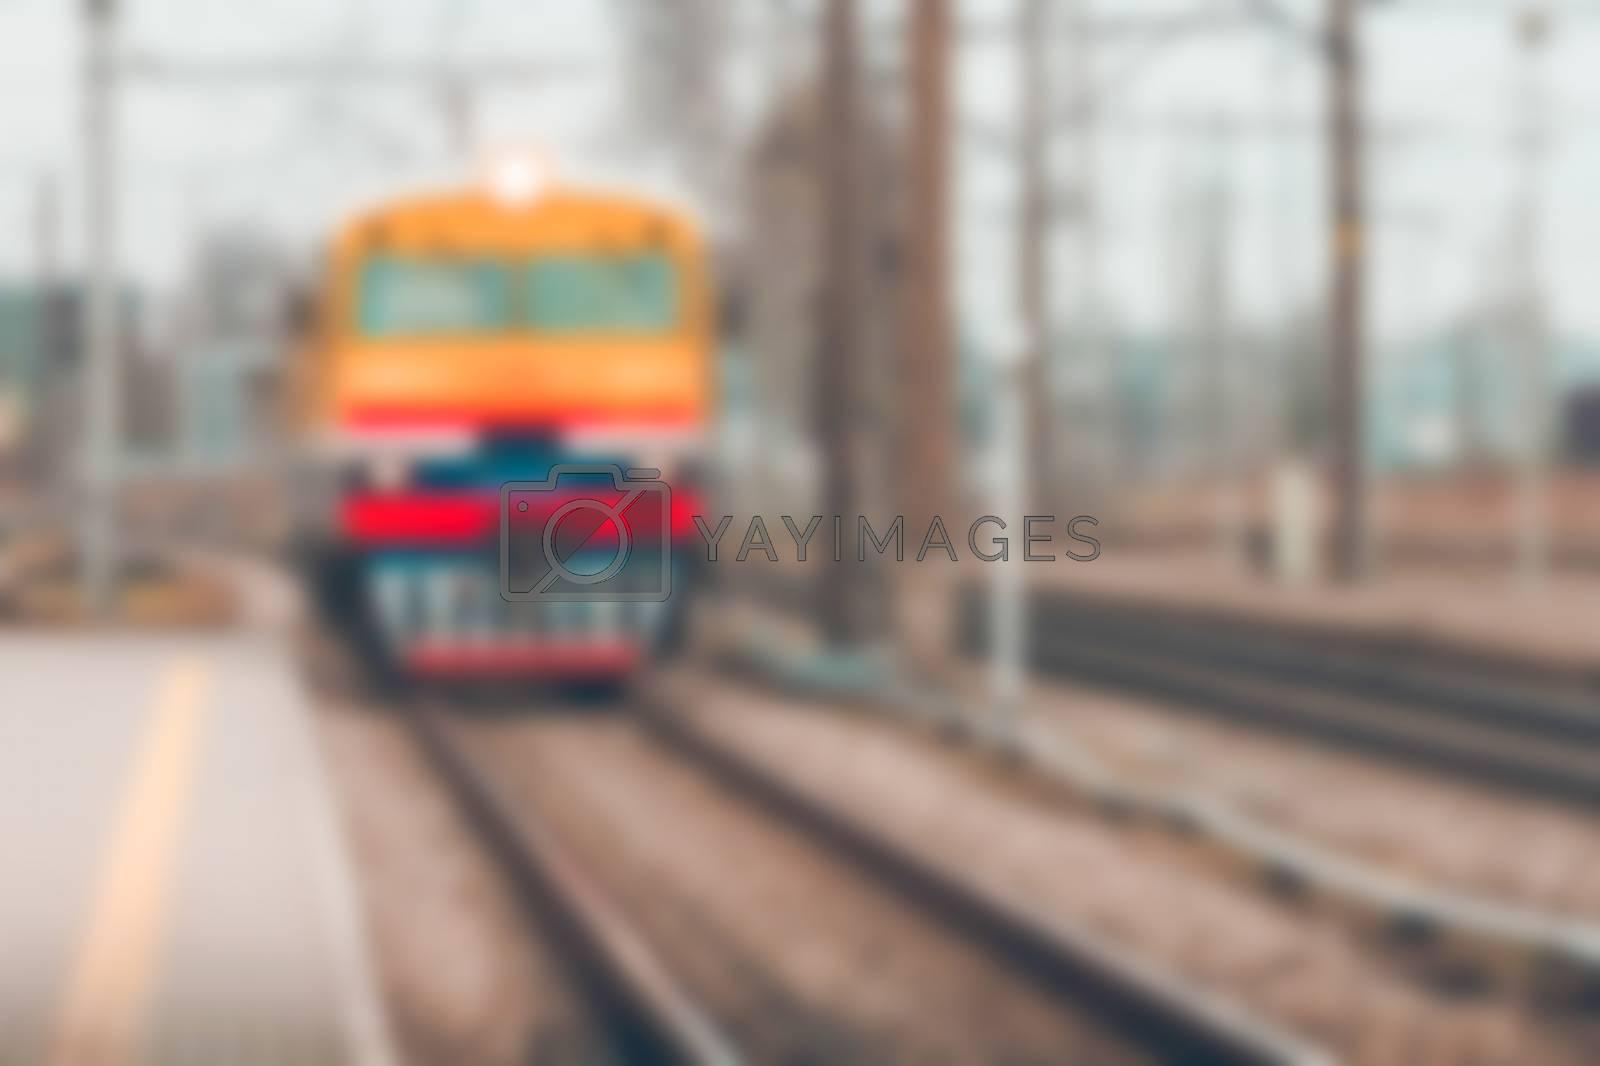 Passenger train - soft lens bokeh image. Defocused background